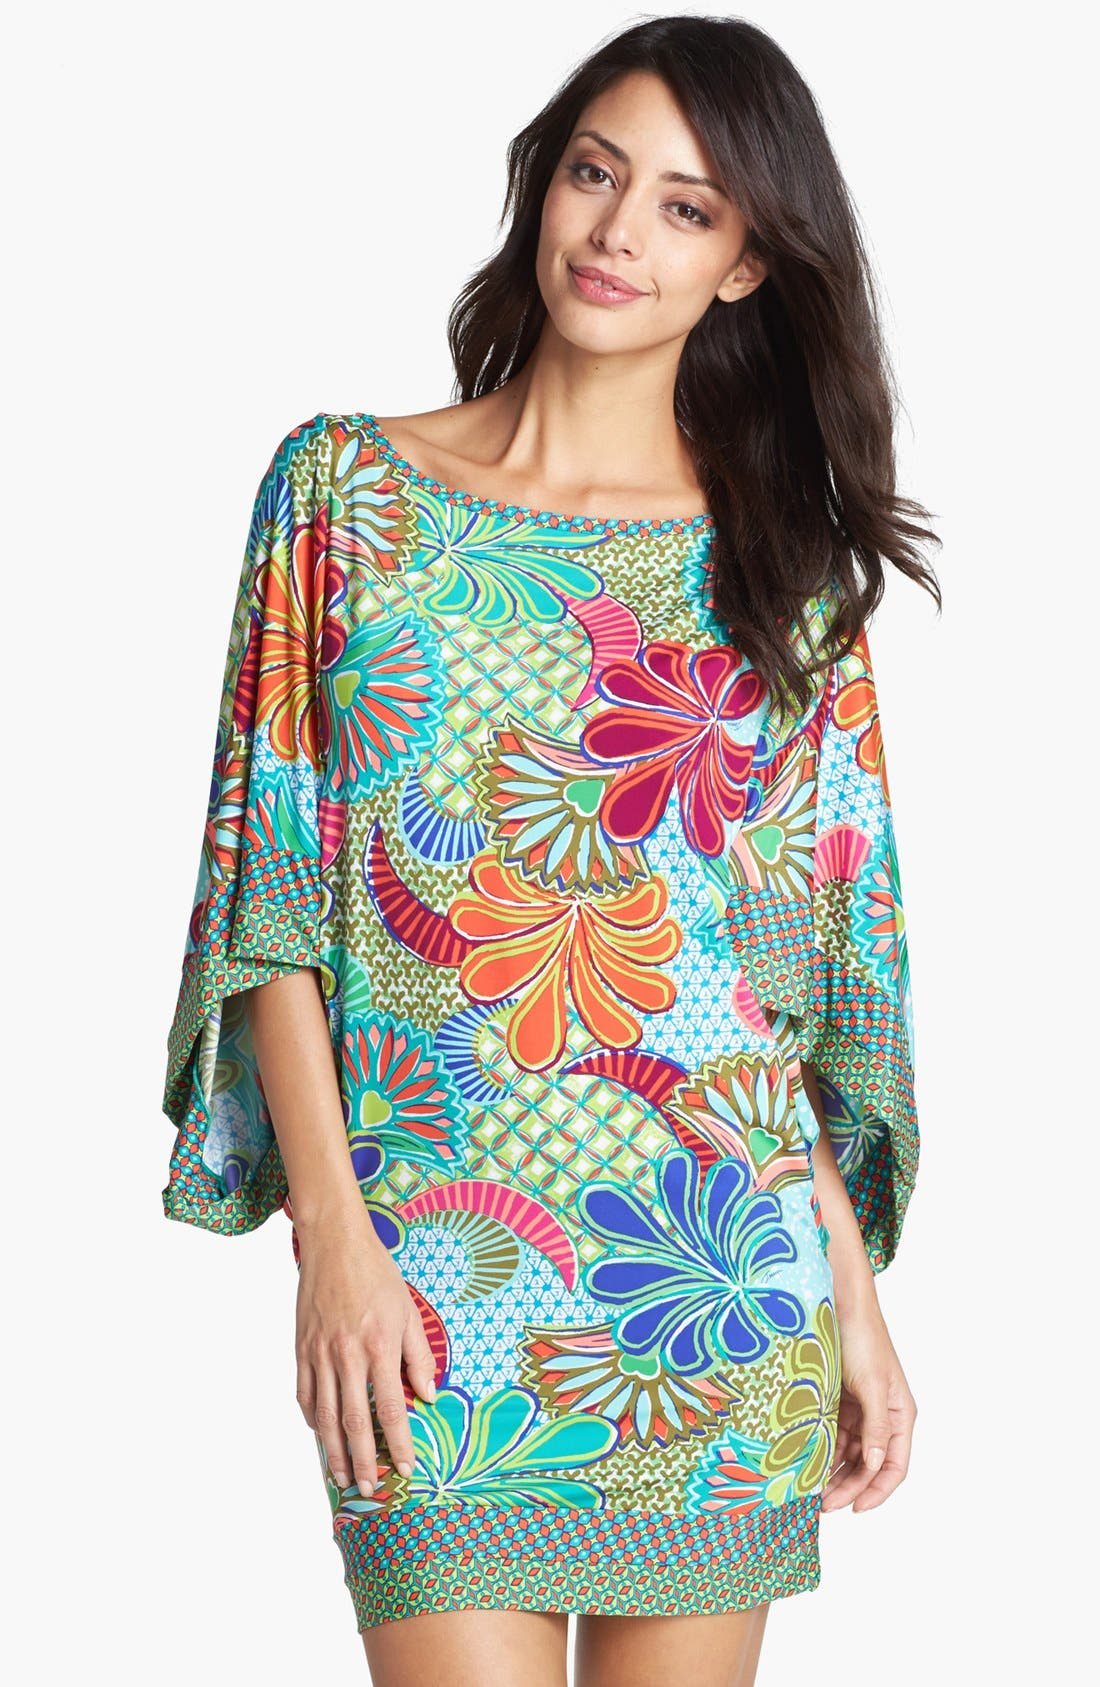 Alternate Image 1 Selected - Trina Turk 'Zanzibar' Tunic Cover-Up